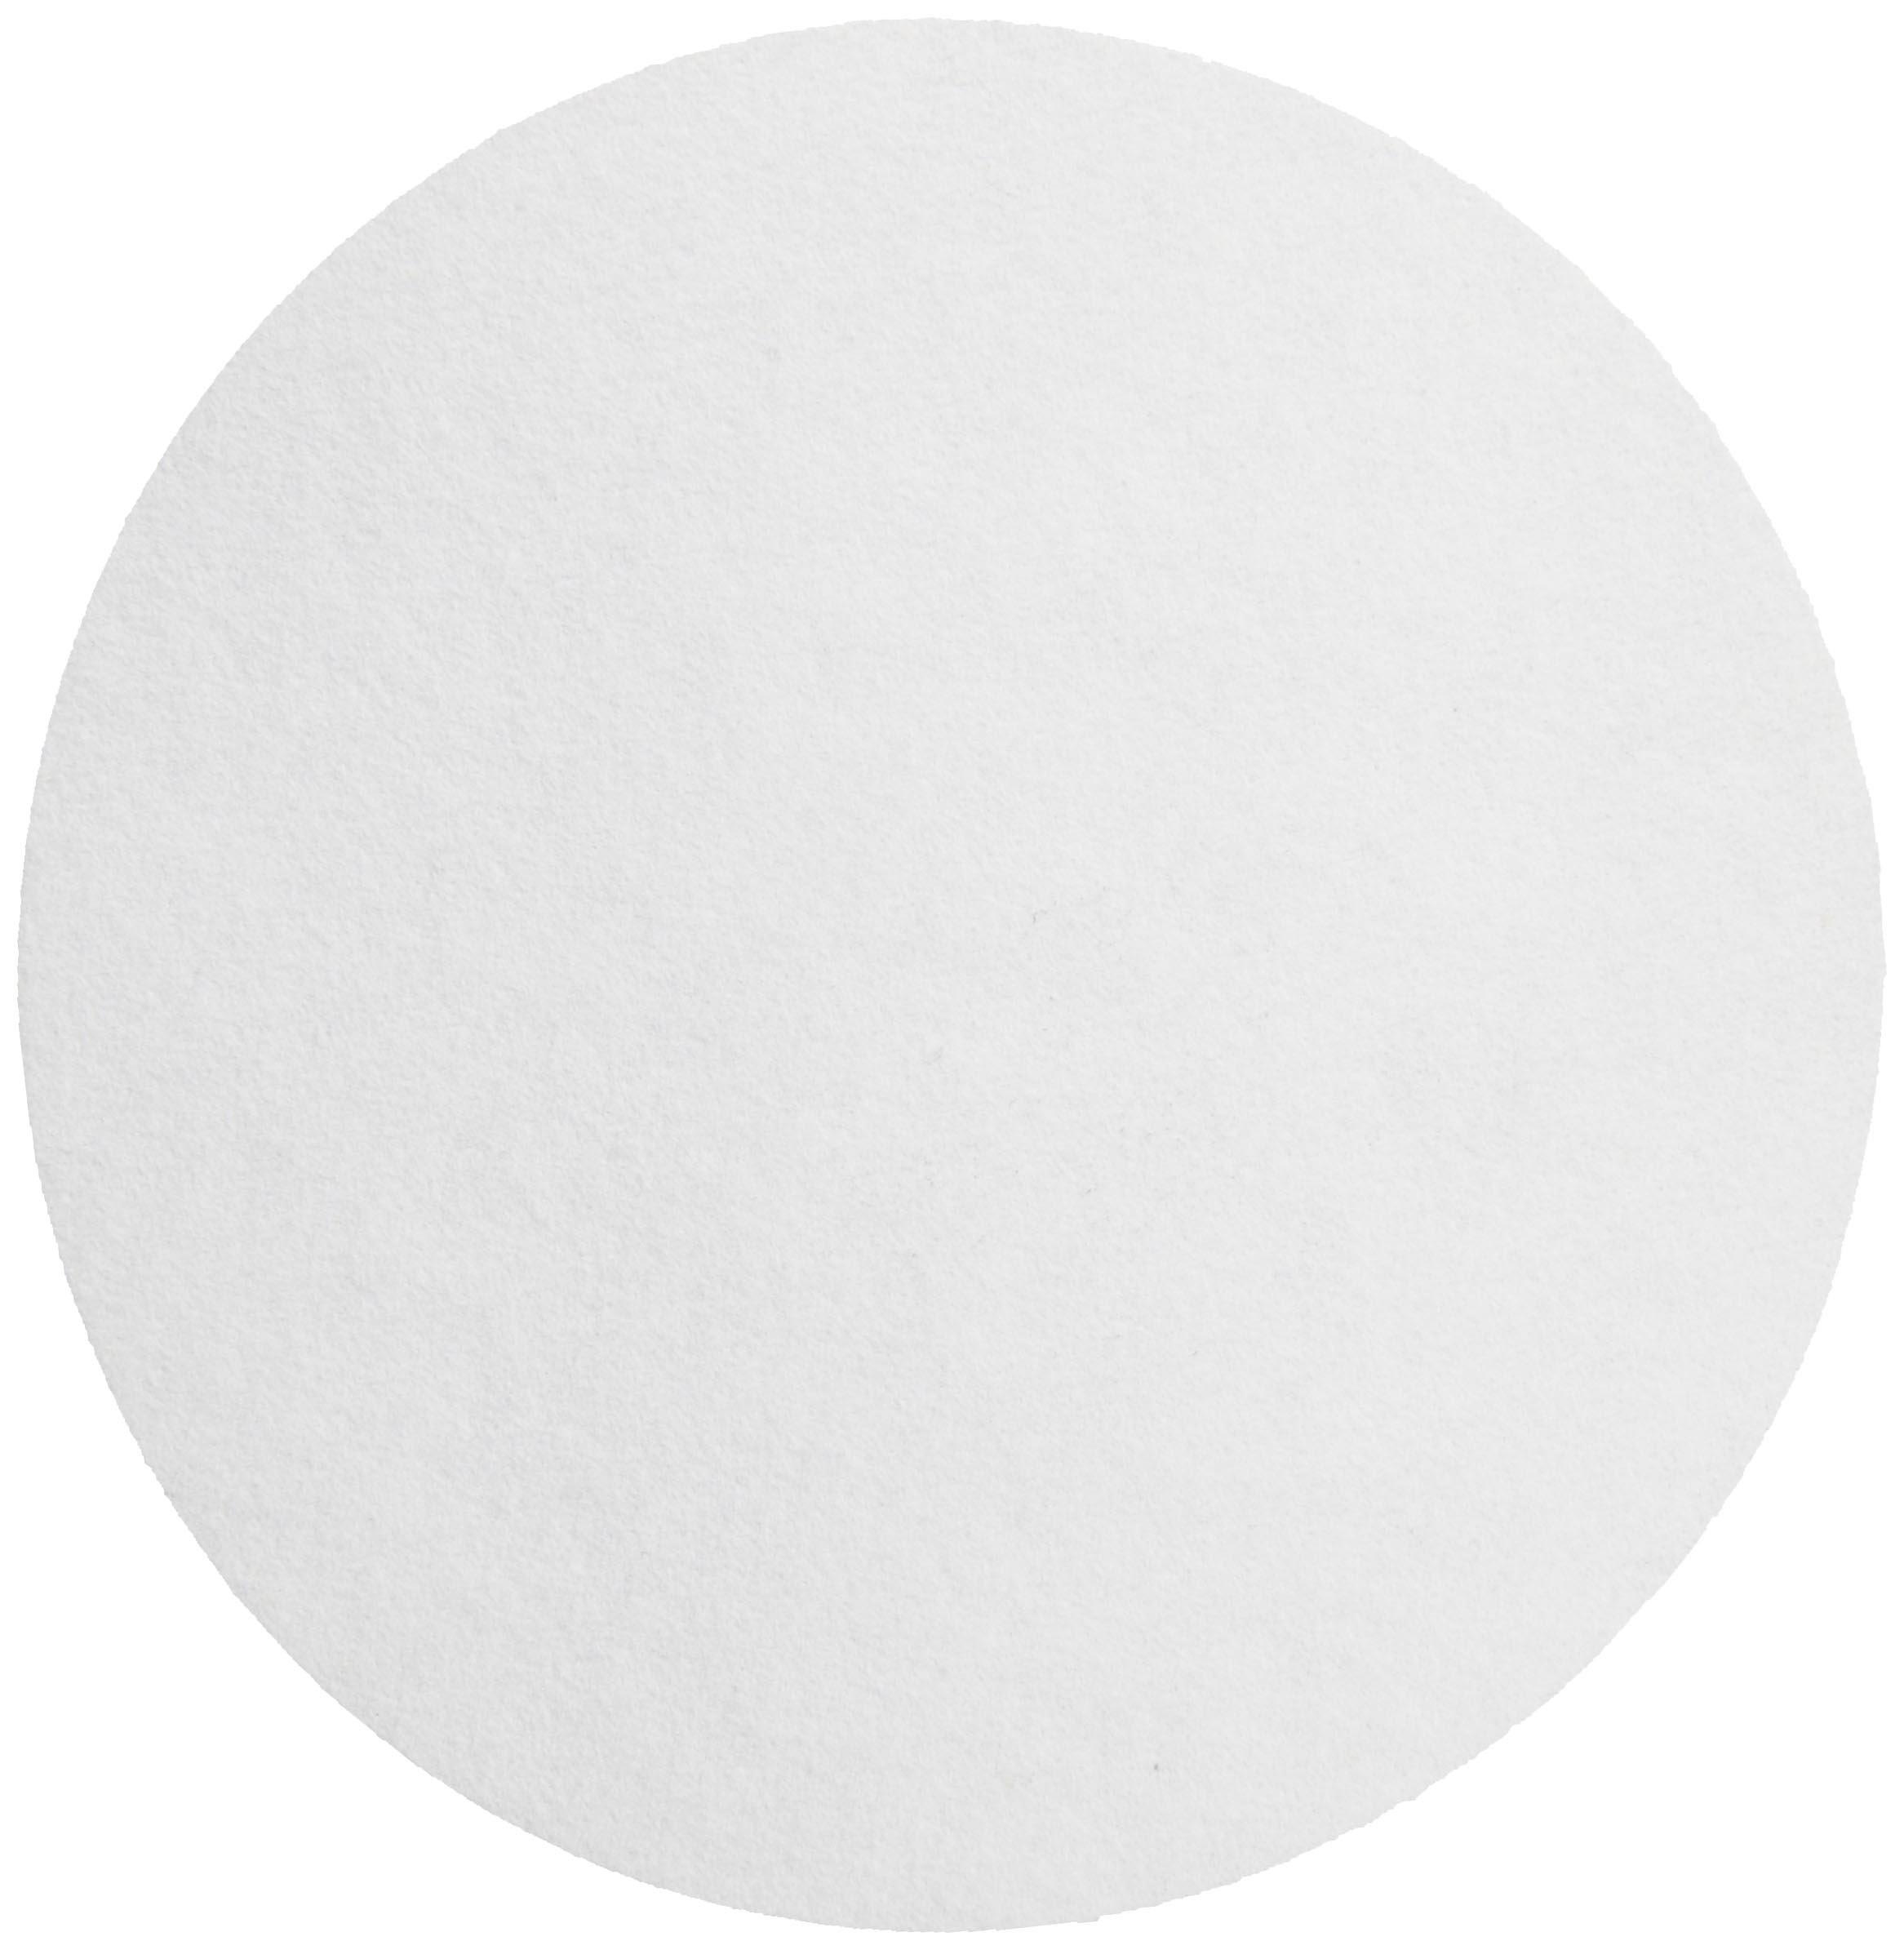 Whatman 1004-090 Quantitative Filter Paper Circles, 20-25 Micron, 3.7 s/100mL/sq inch Flow Rate, Grade 4, 90mm Diameter (Pack of 100)